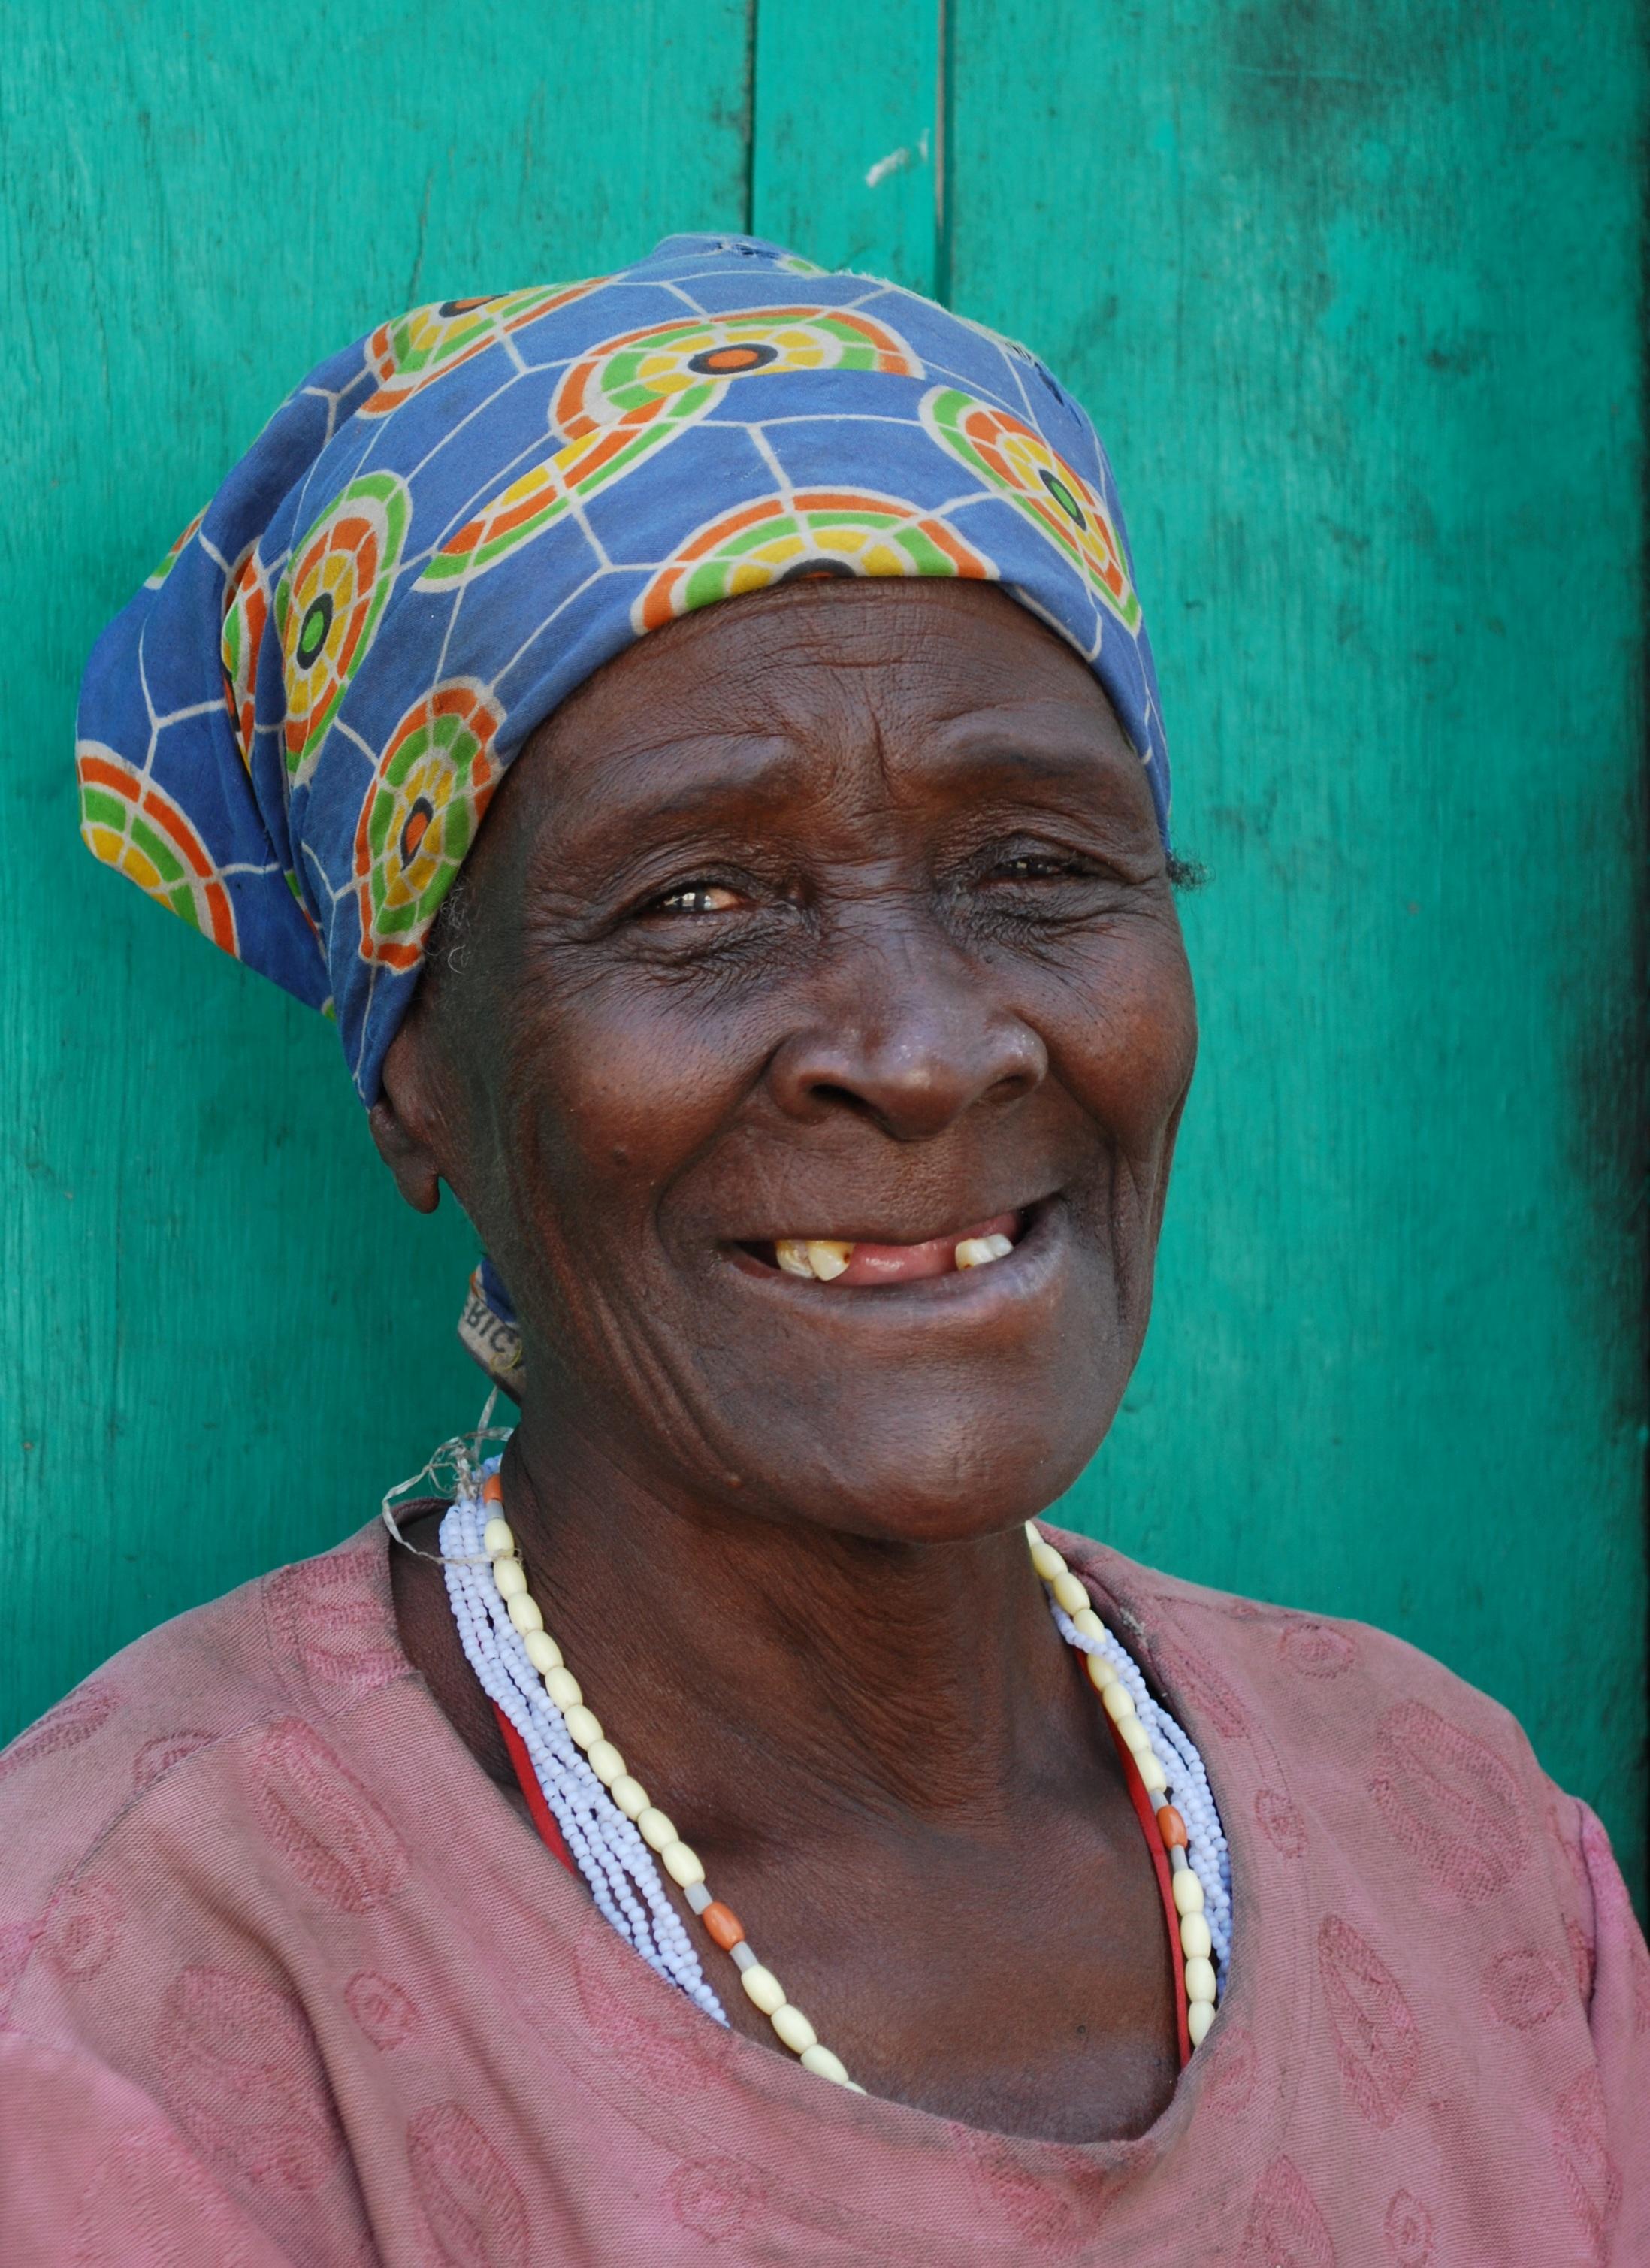 Zambia 2010 (1605).JPG